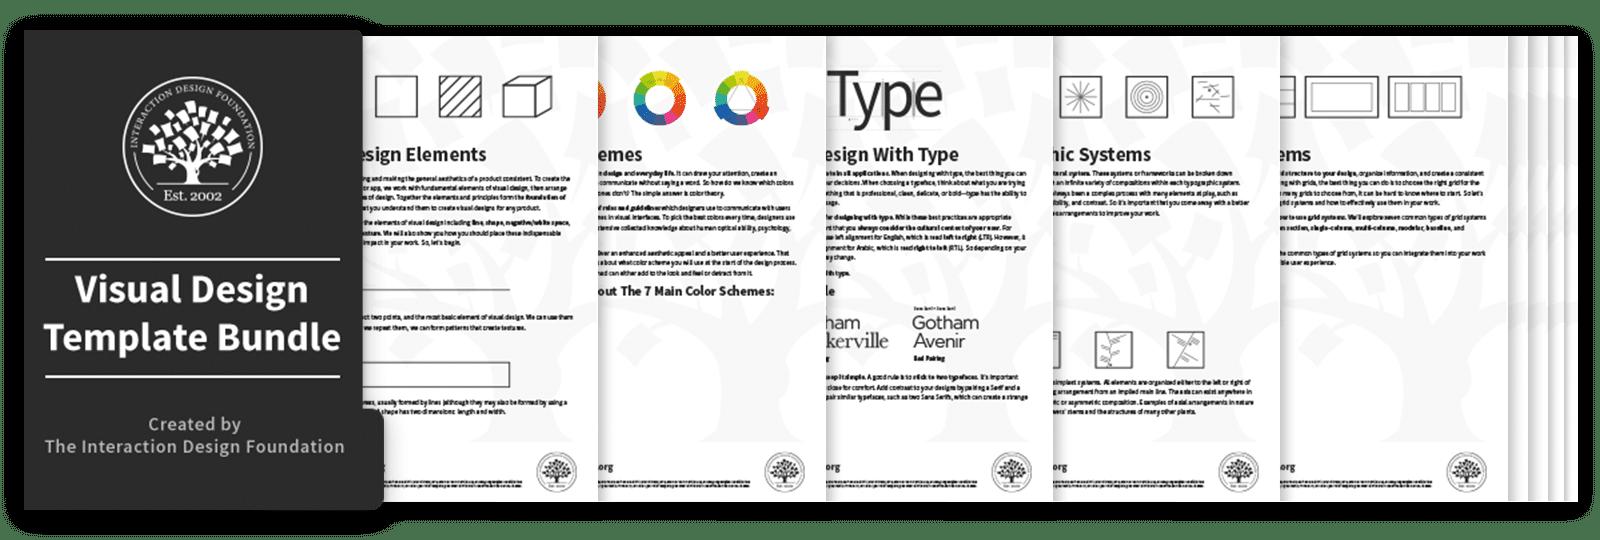 Bundle of 11 Visual Design templates